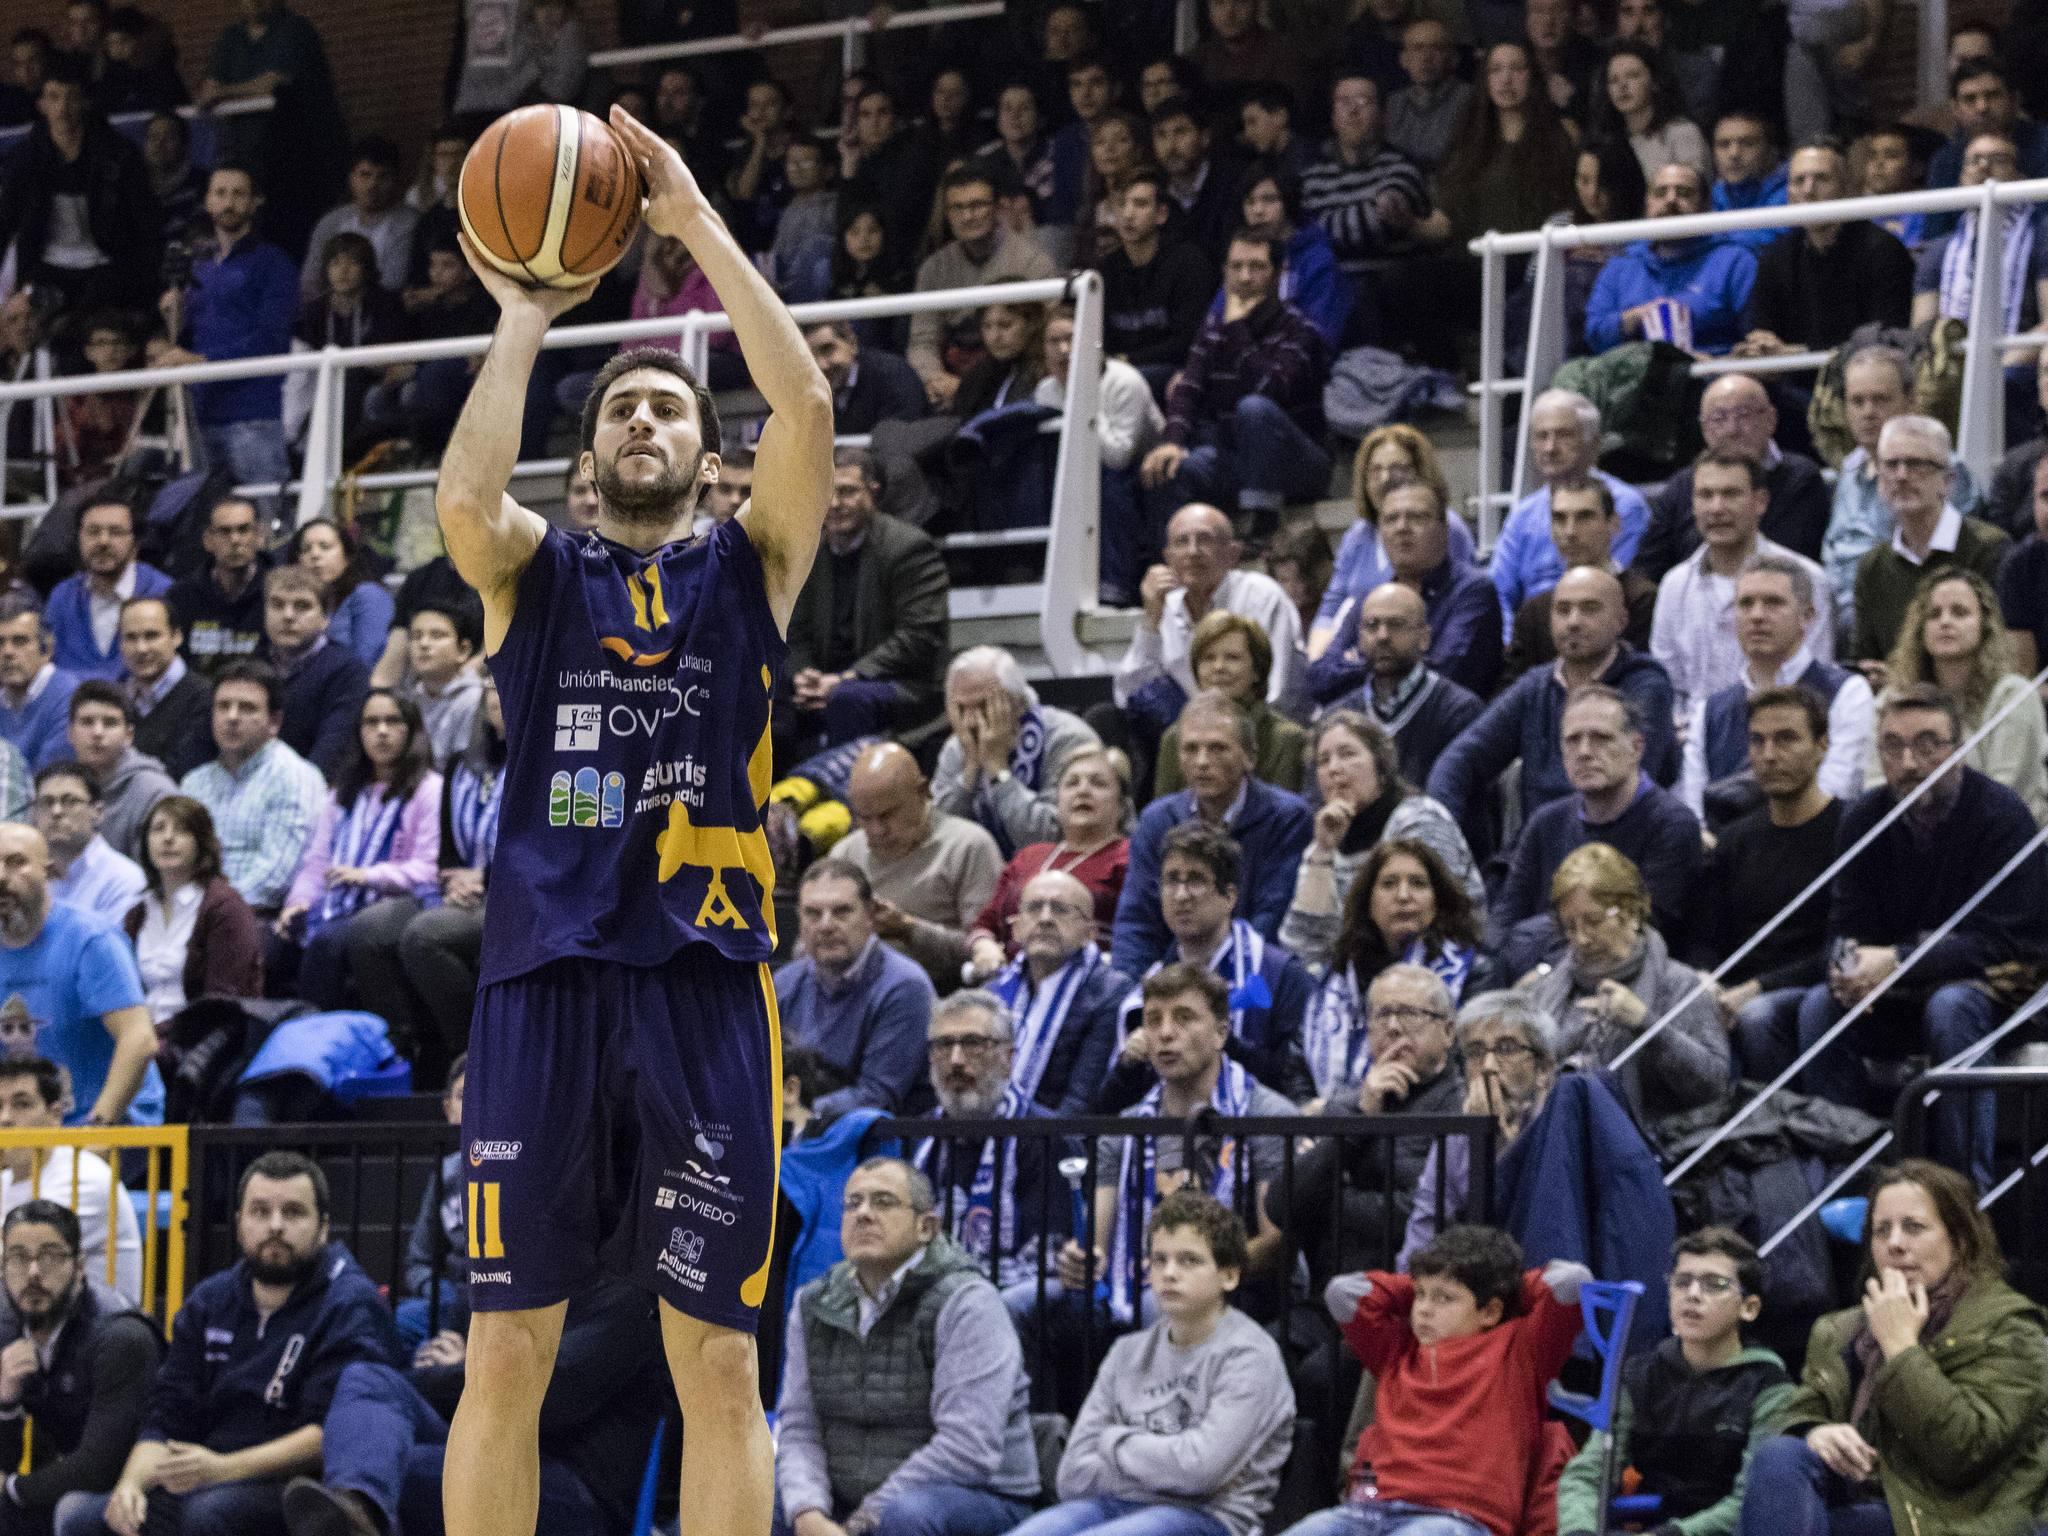 Manu Rodríguez lanzando un triple (Foto: Christian García)